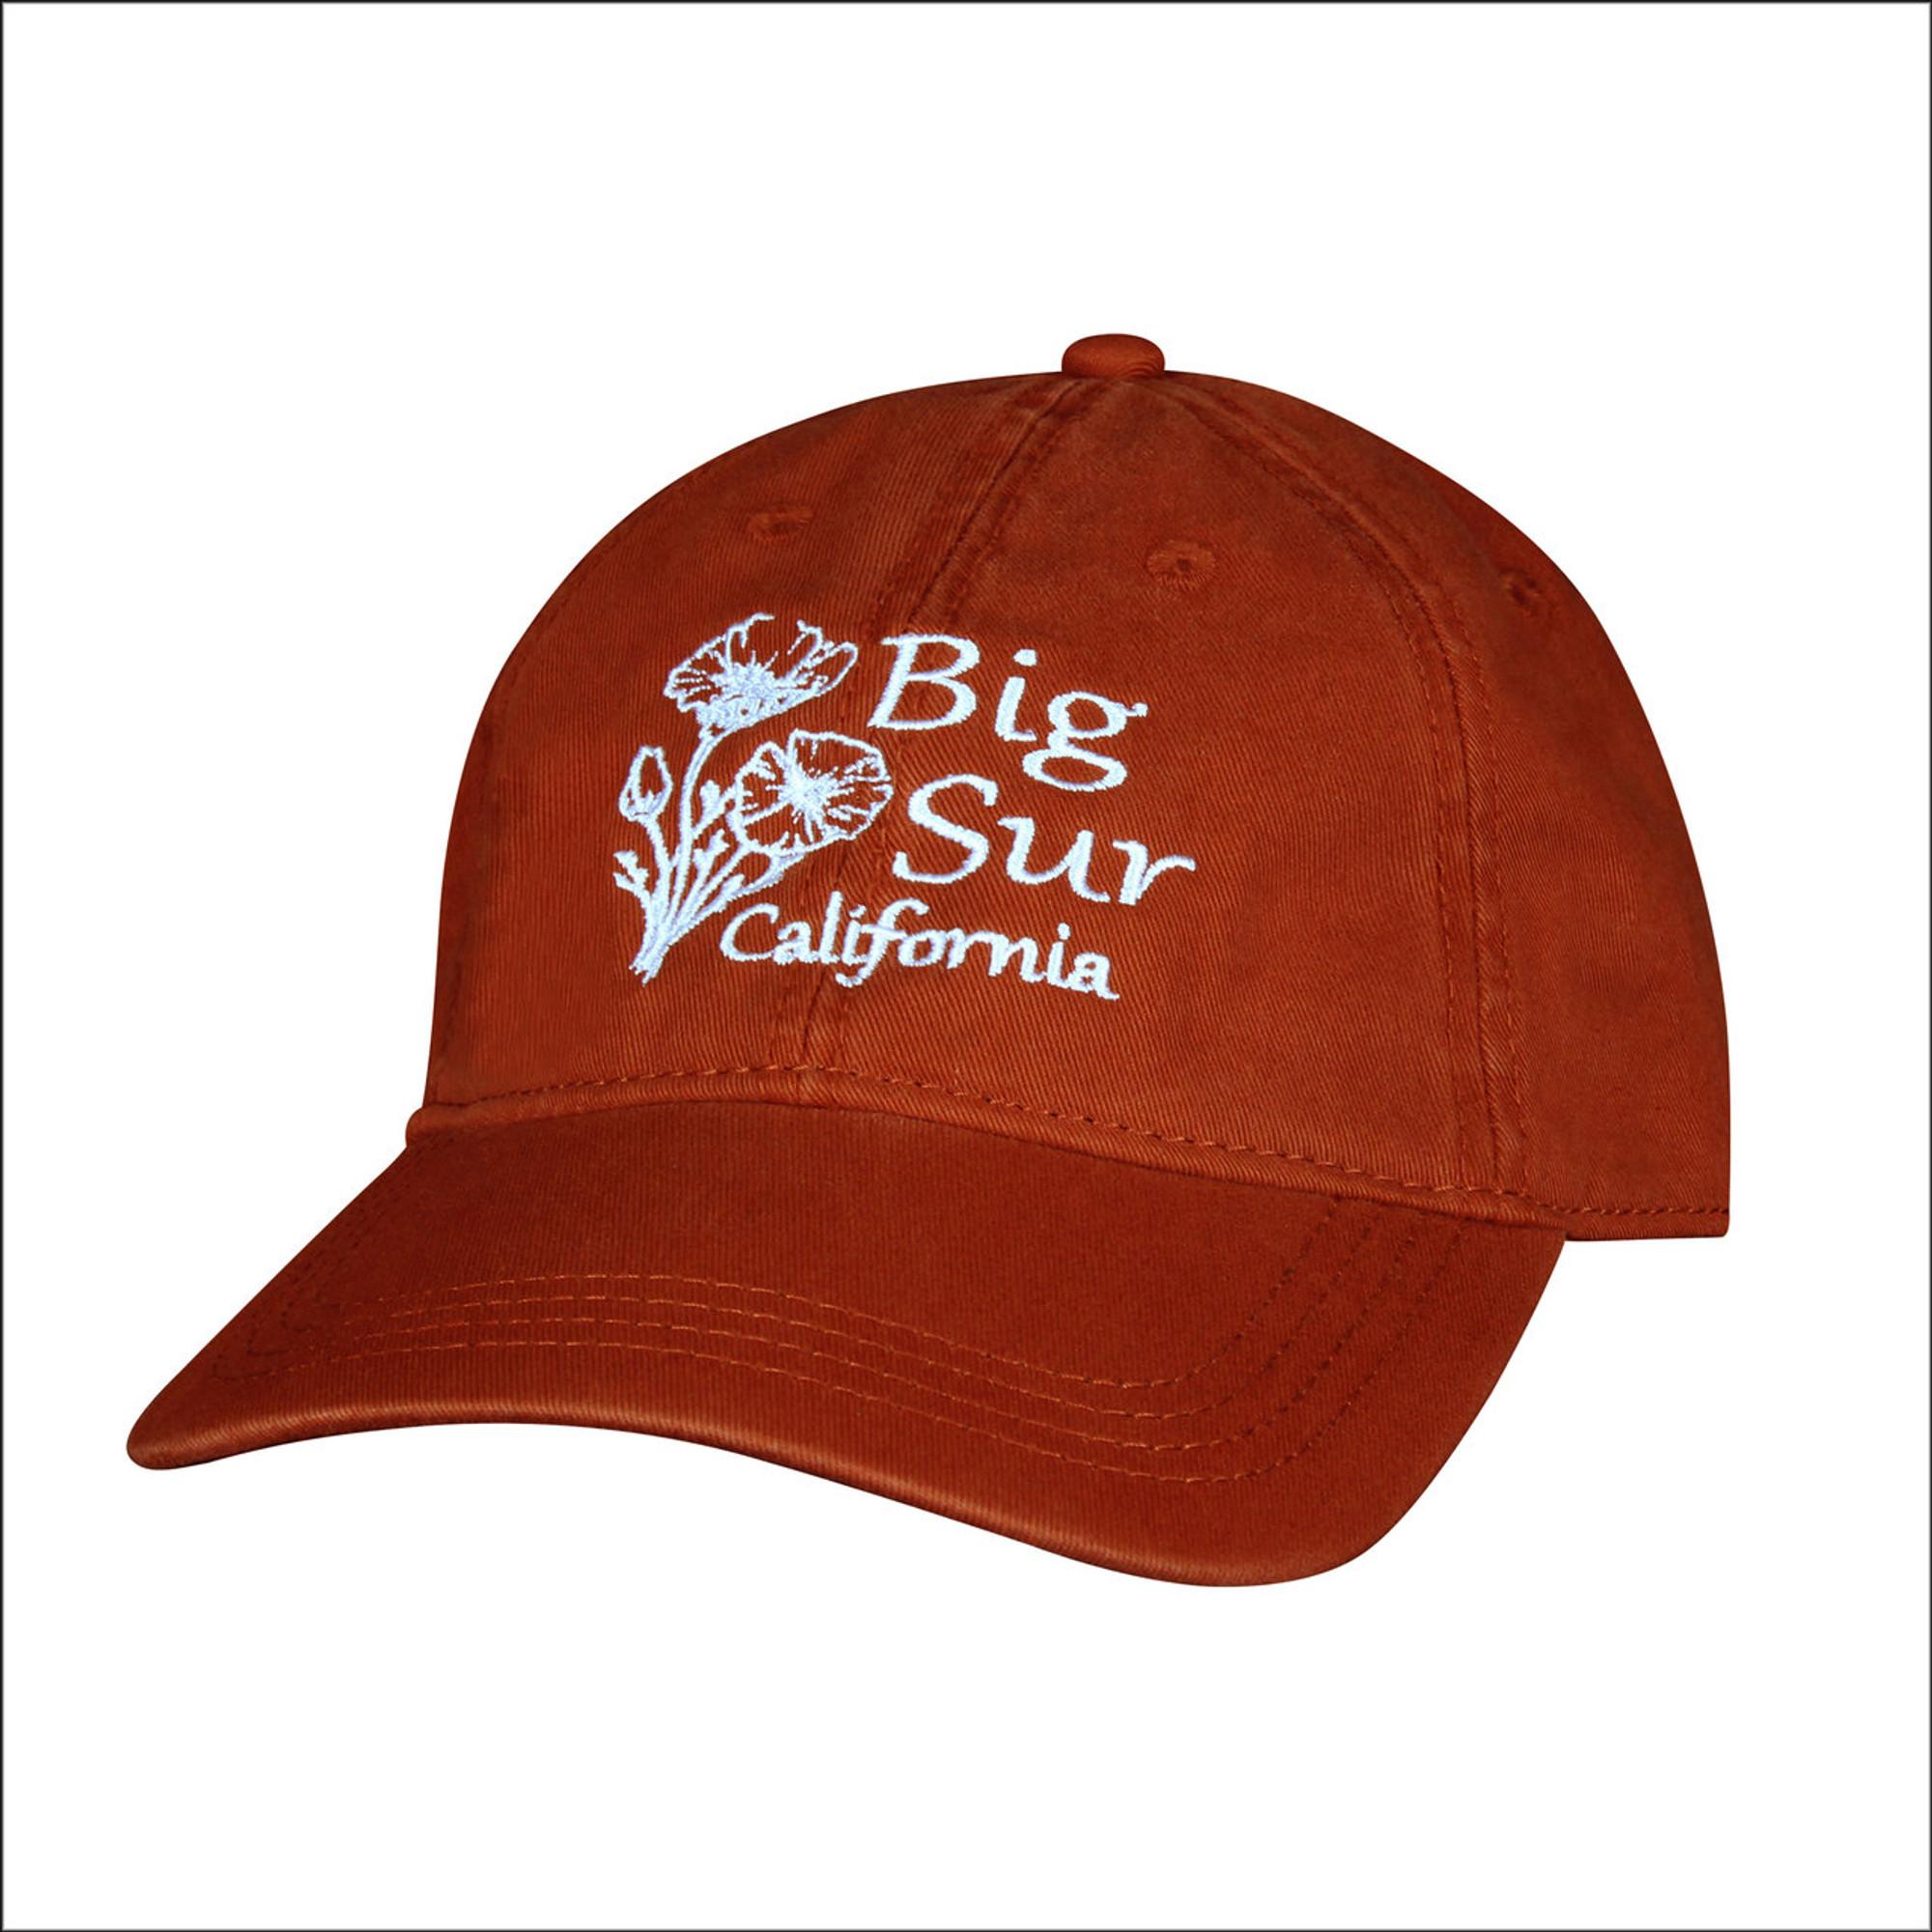 5bc444fb351 Baseball Cap • Poppies - Burnt Orange - Real Big Sur